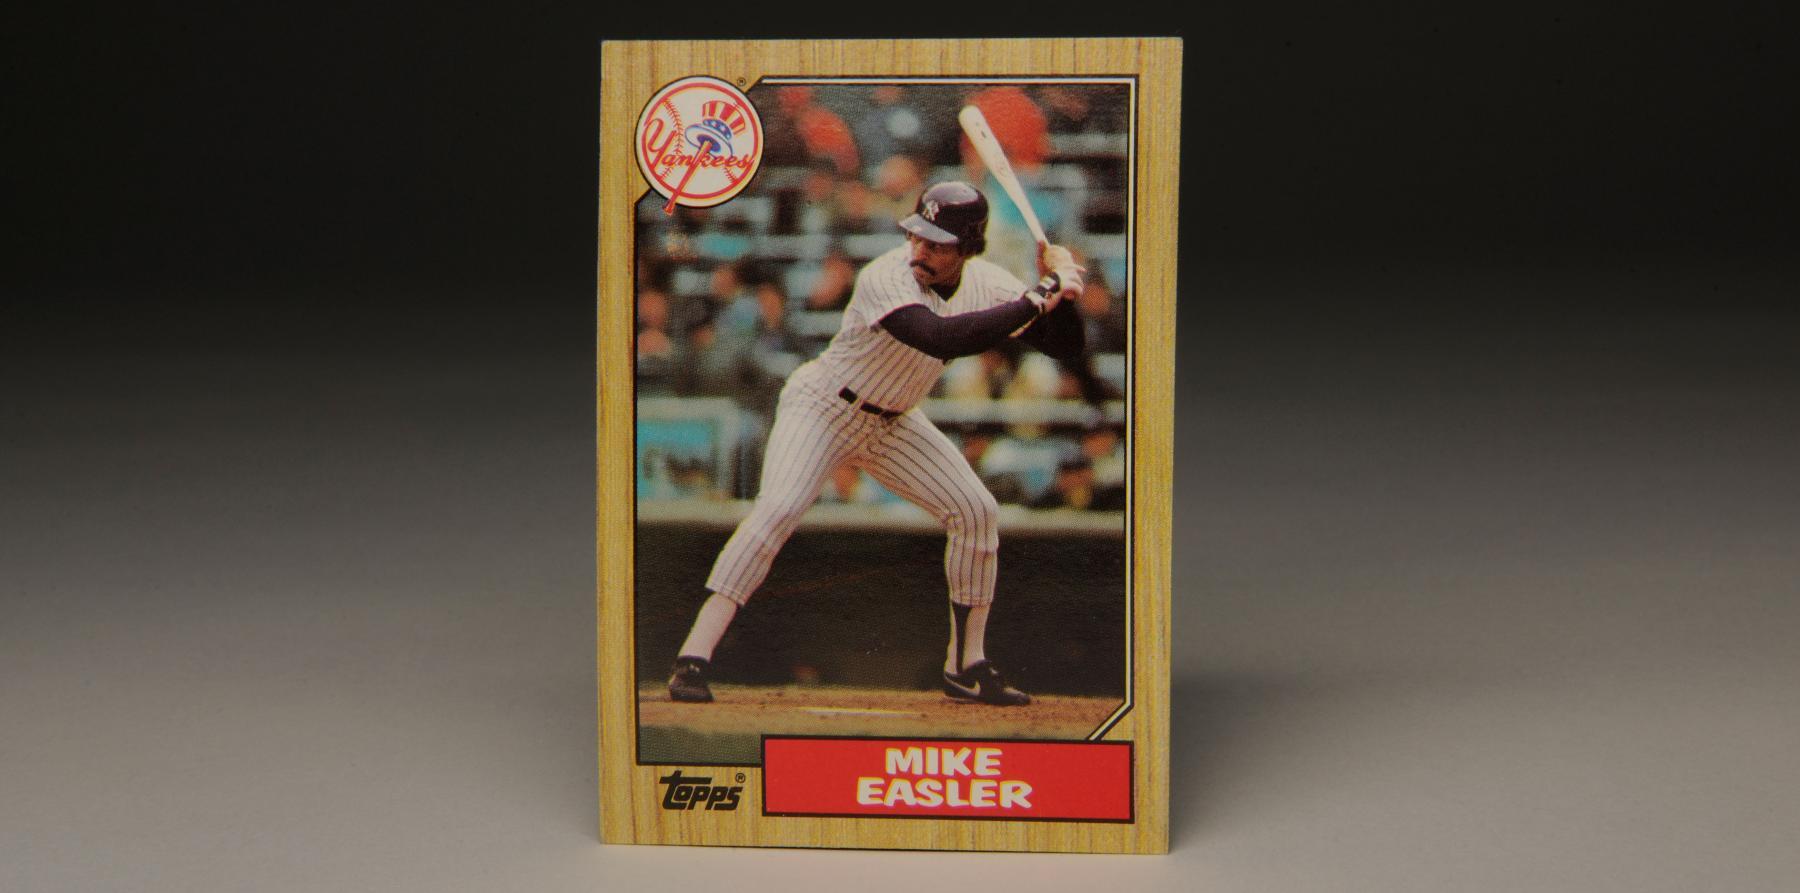 1987 Topps wood-bordered Mike Easler card. (Milo Stewart, Jr. / National Baseball Hall of Fame)